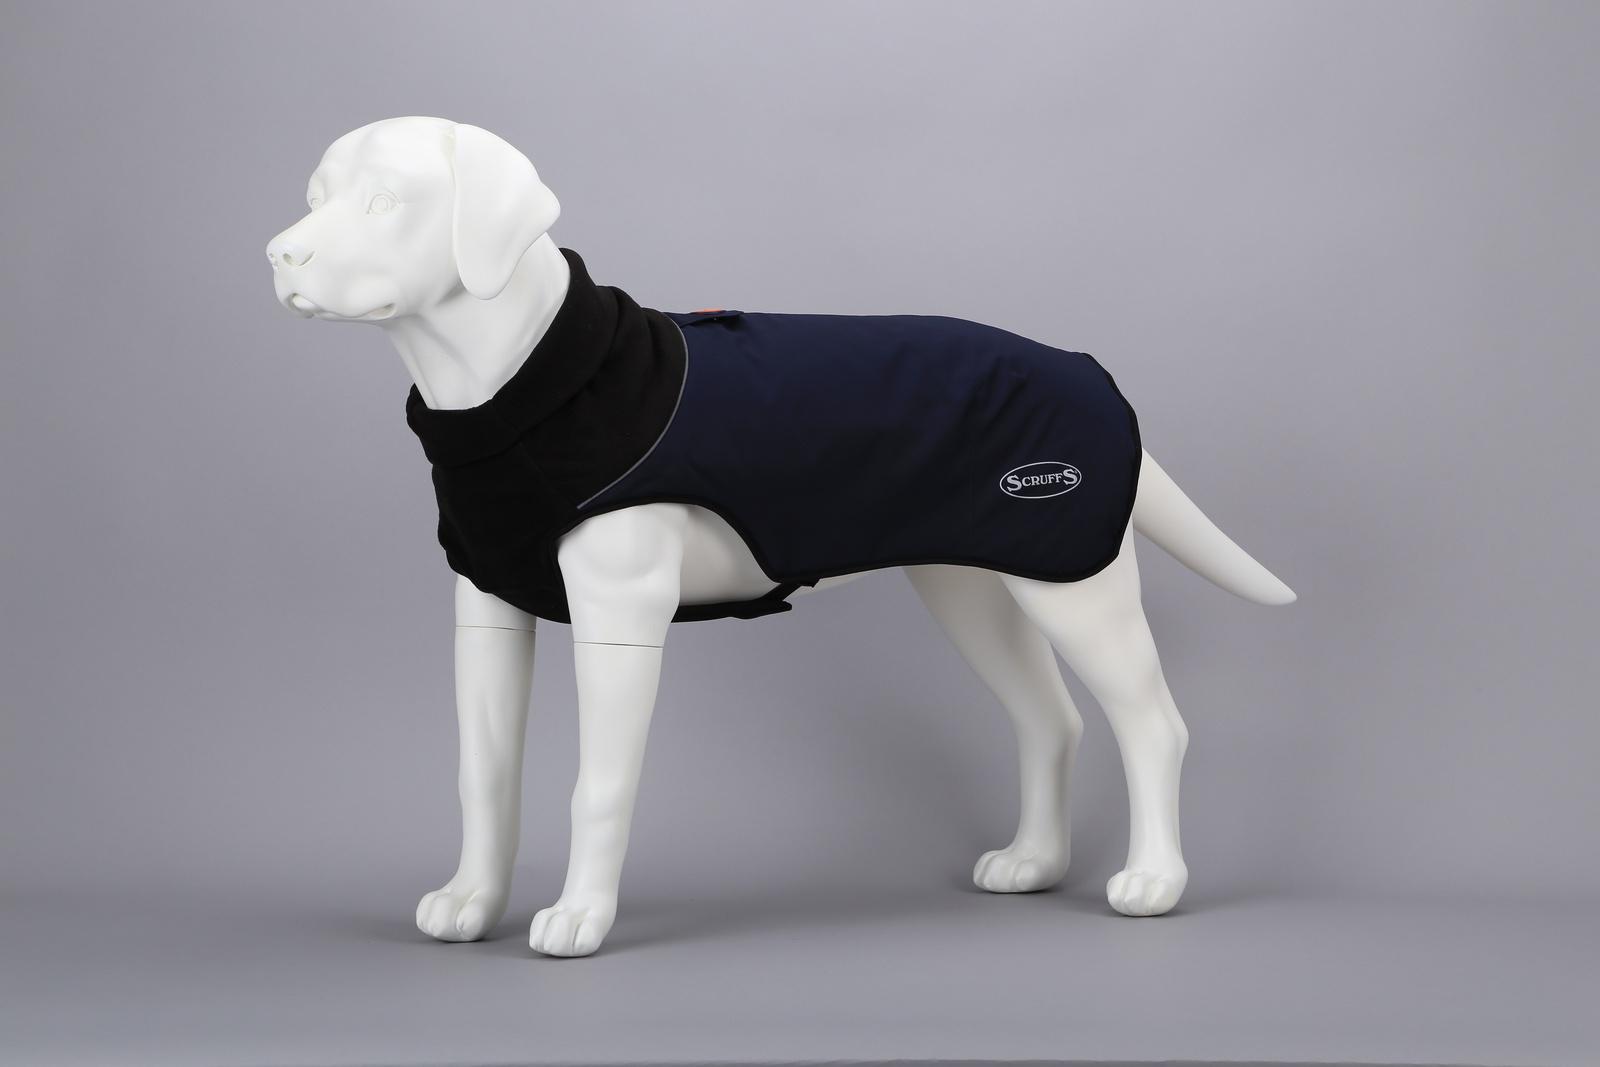 Одежда для собак SCRUFFS Thermal Попона согревающая 936075, 30см, темно-синий